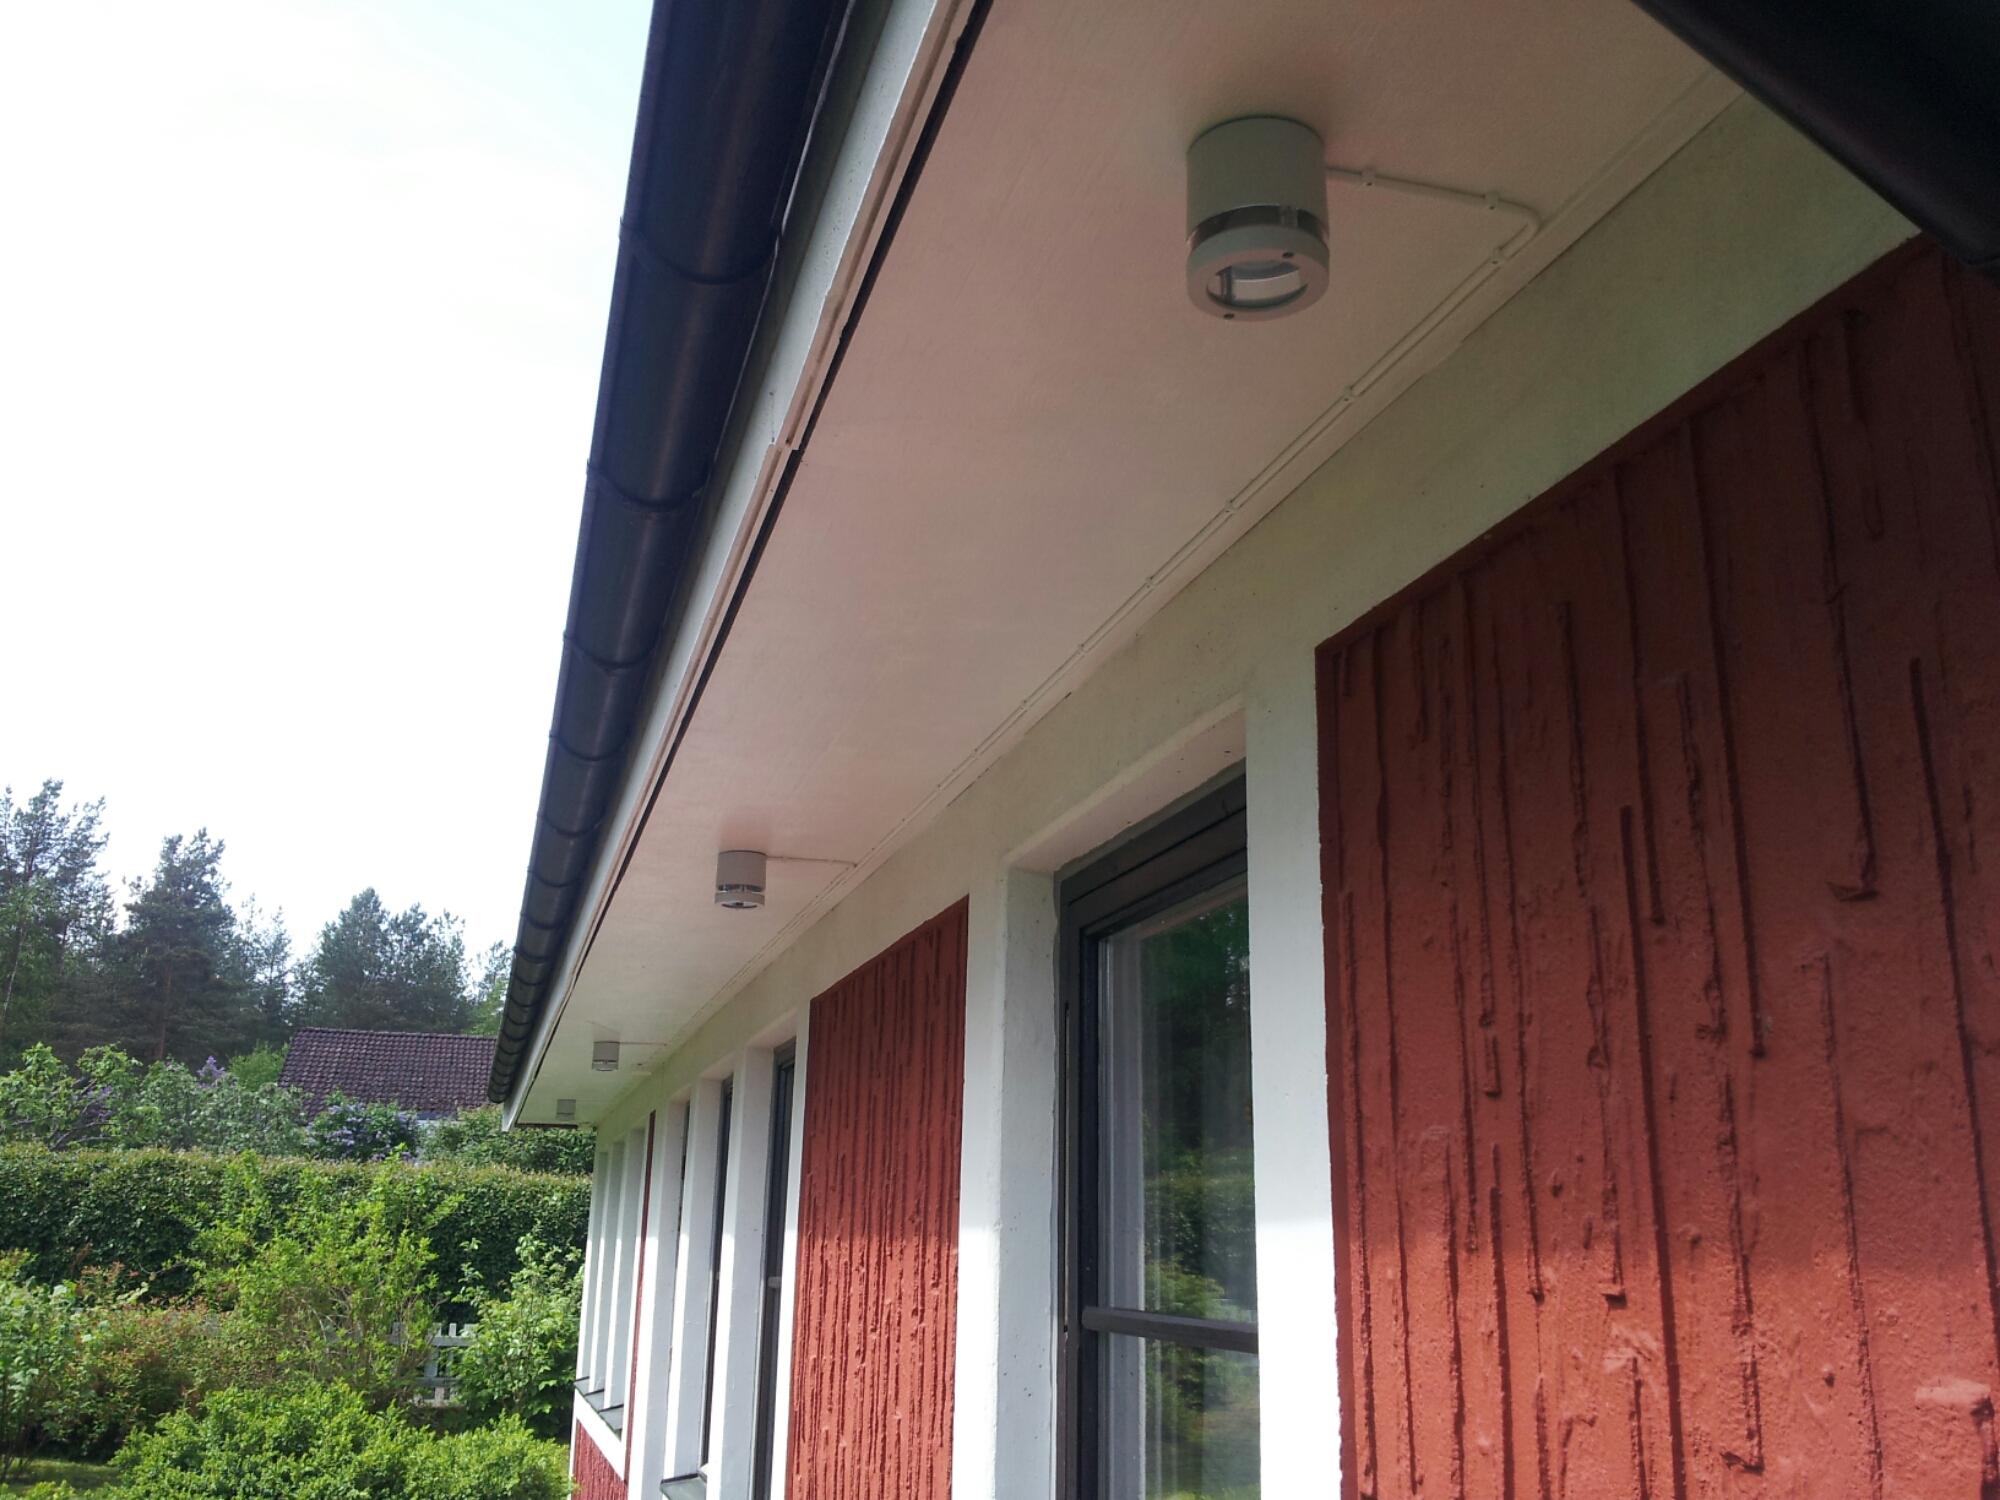 fasadbelysning led takfot